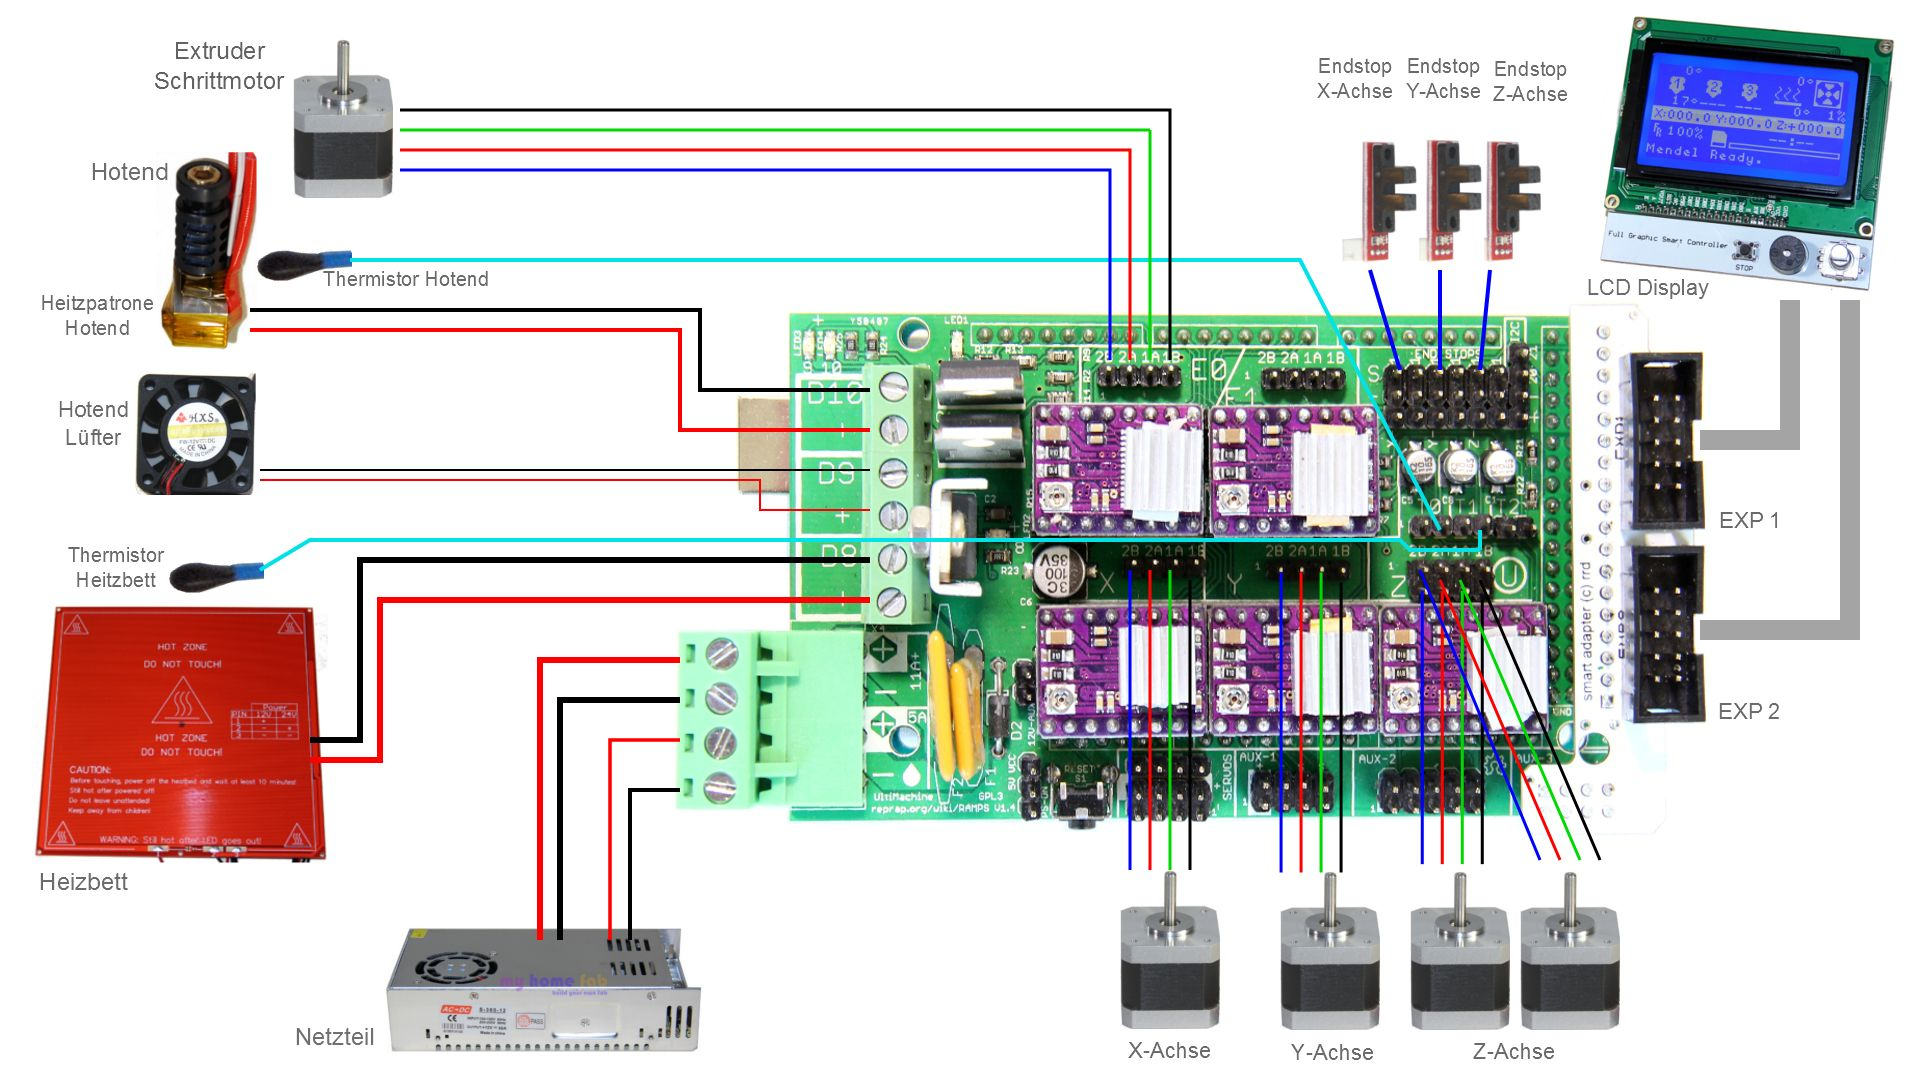 ramps 1 4 pin diagram ramps image wiring diagram ramps 1 4 schema 1920px 1920 1080 3d stuff on ramps 1 4 pin diagram